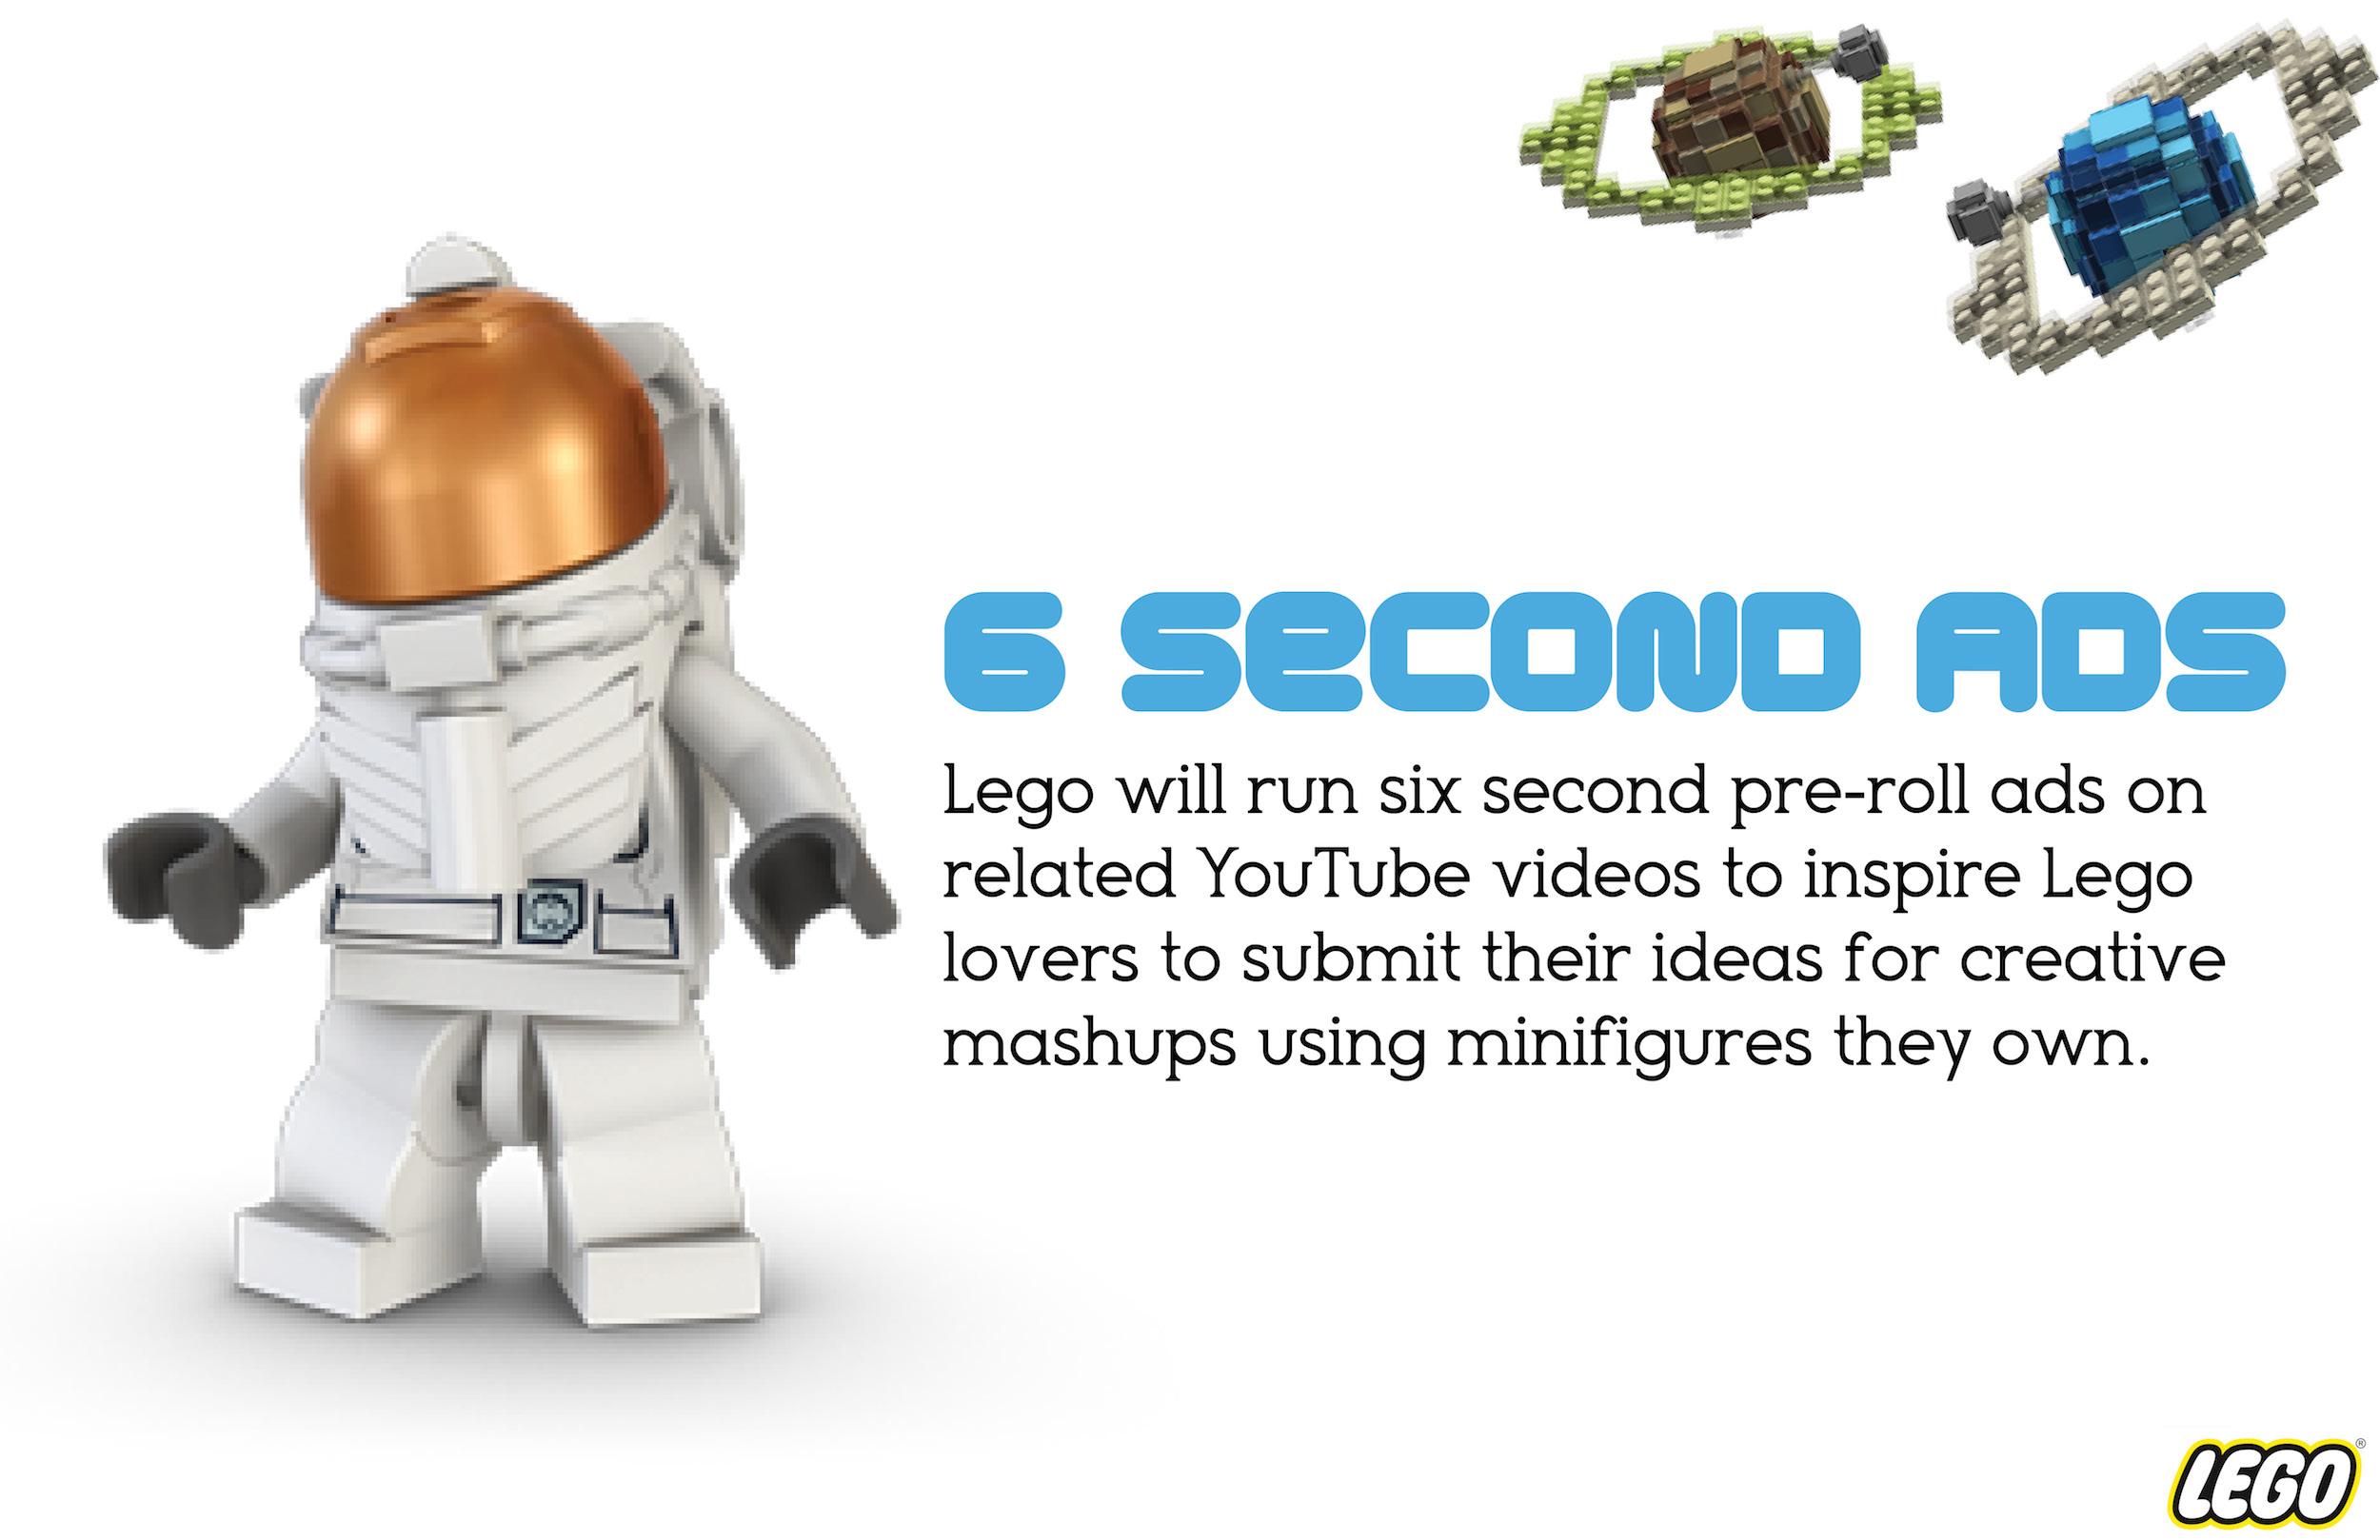 LEGOSfinaledit3 (1).jpg